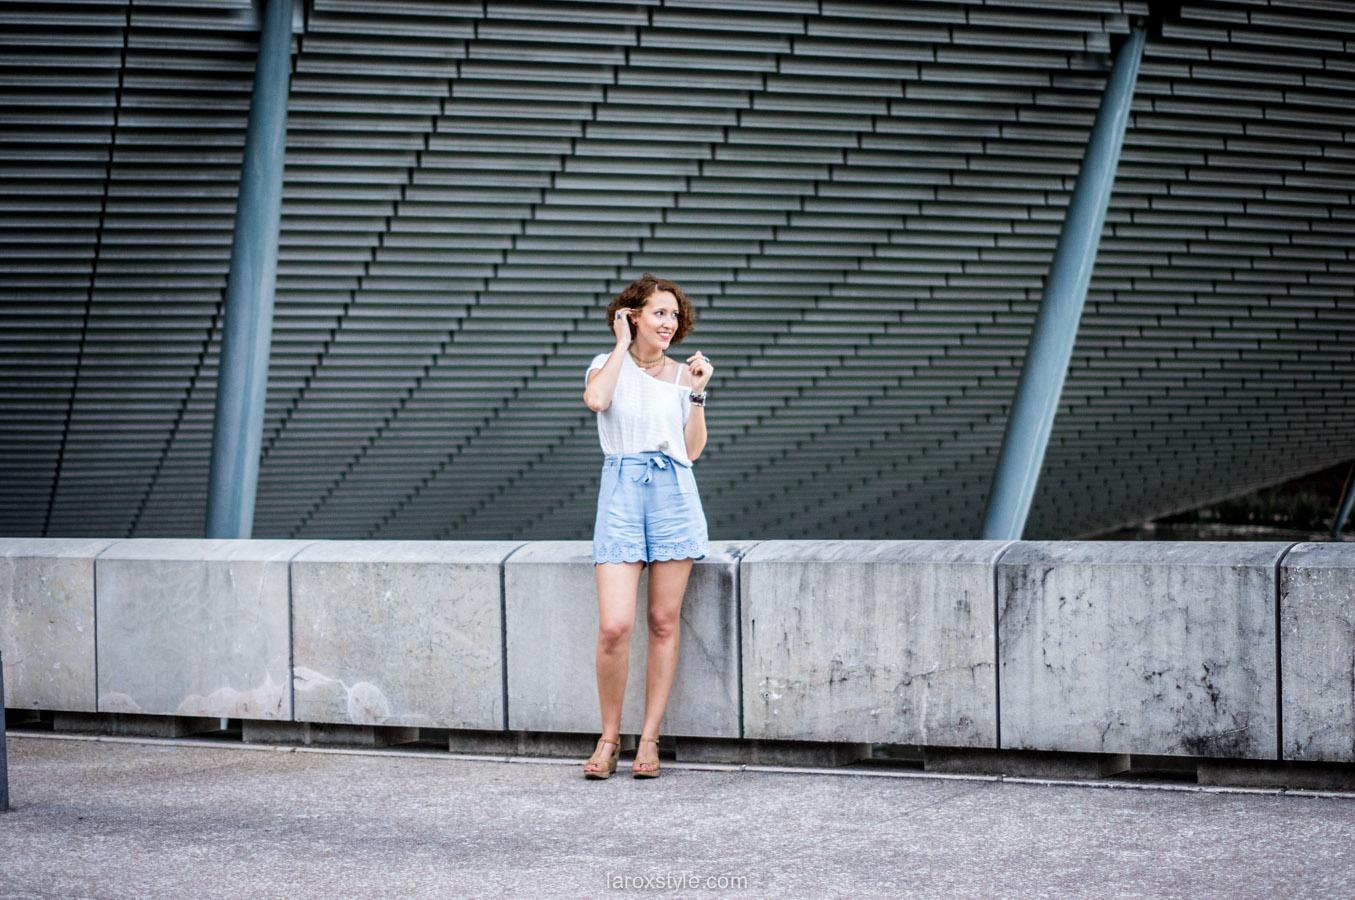 summer look chic - coiffeur confidences prestige - blog mode lyon